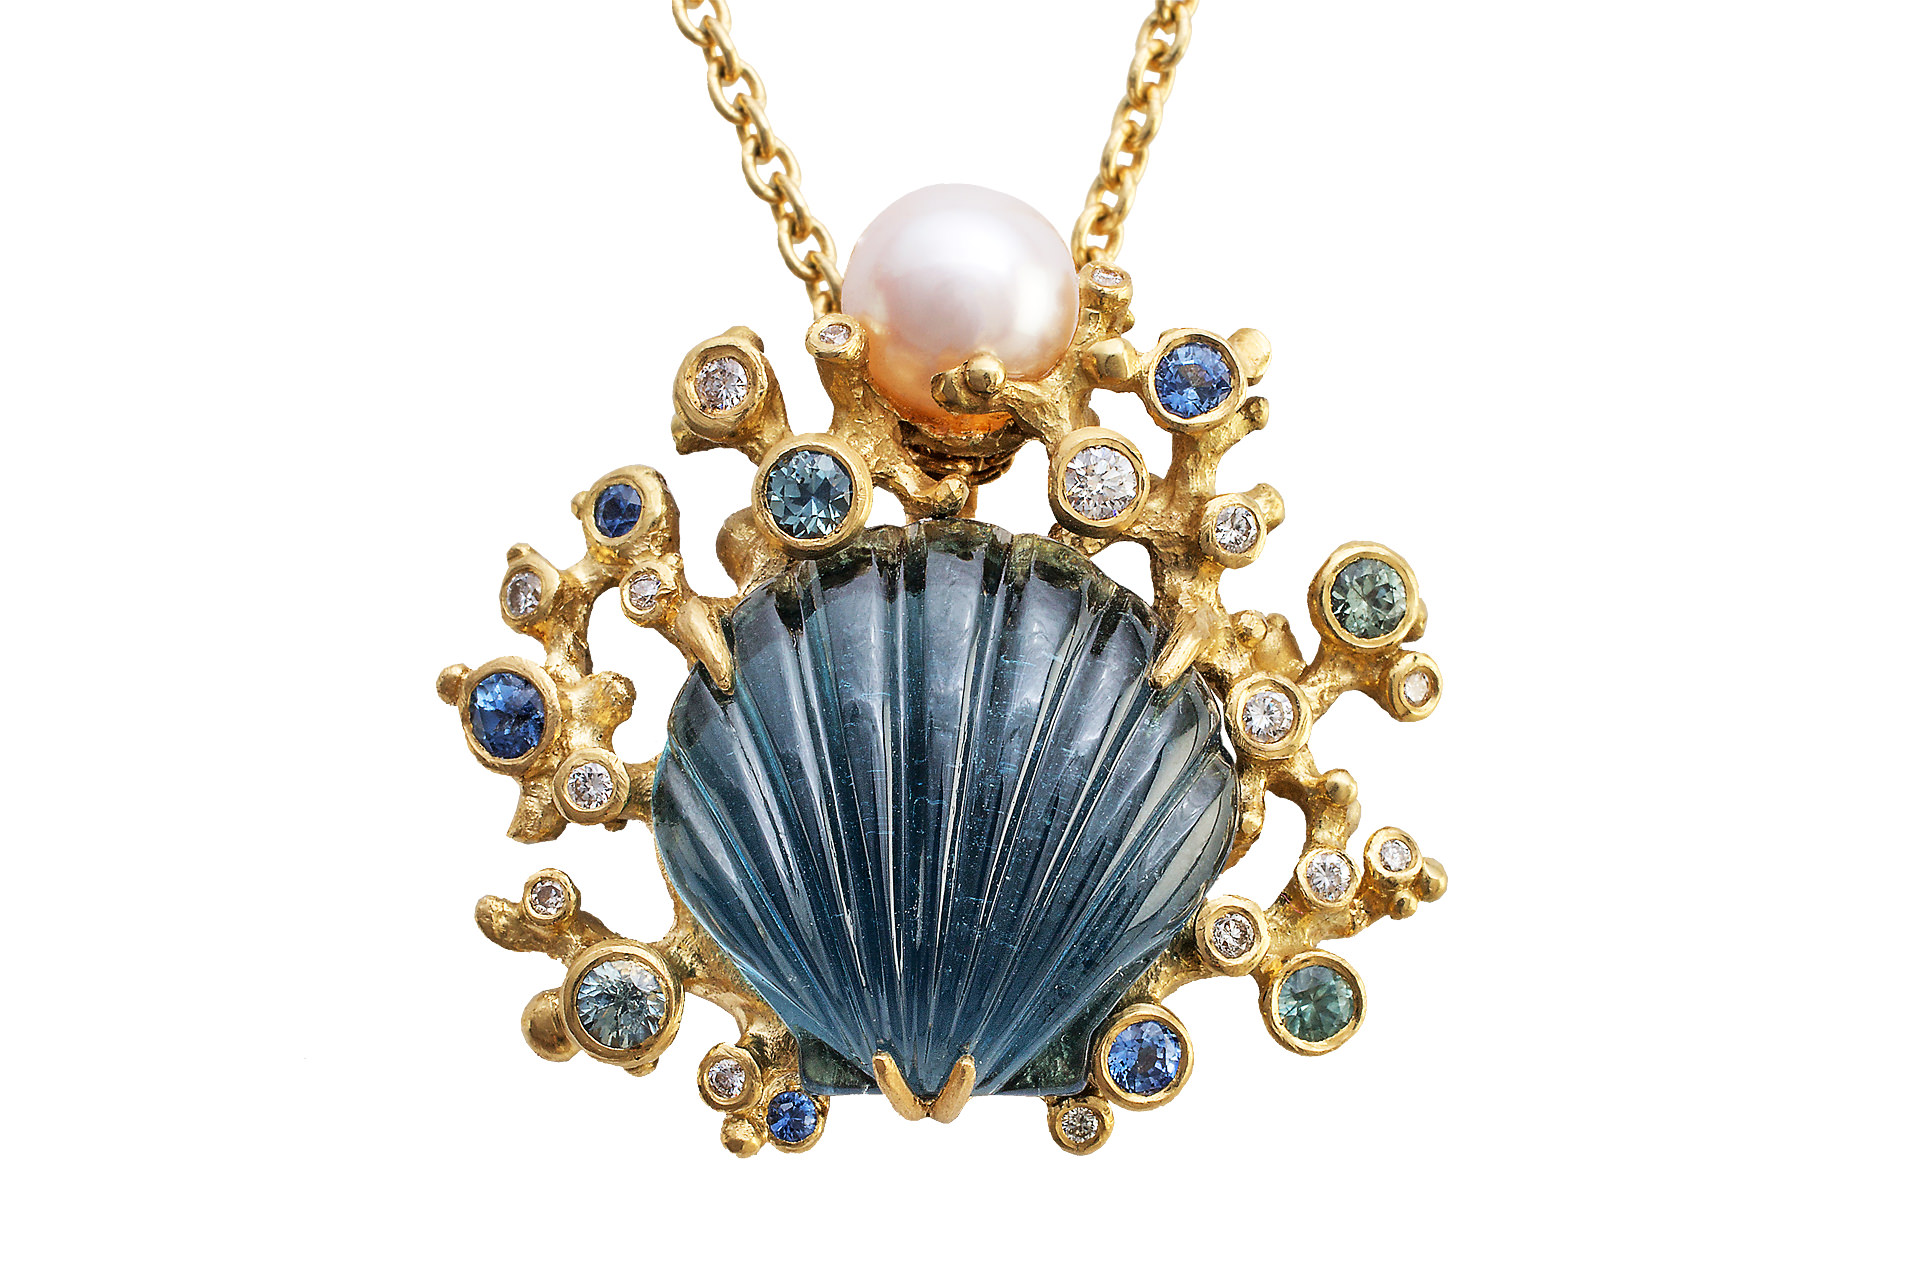 commercial-jewelry-photography-portfolio-006.jpg